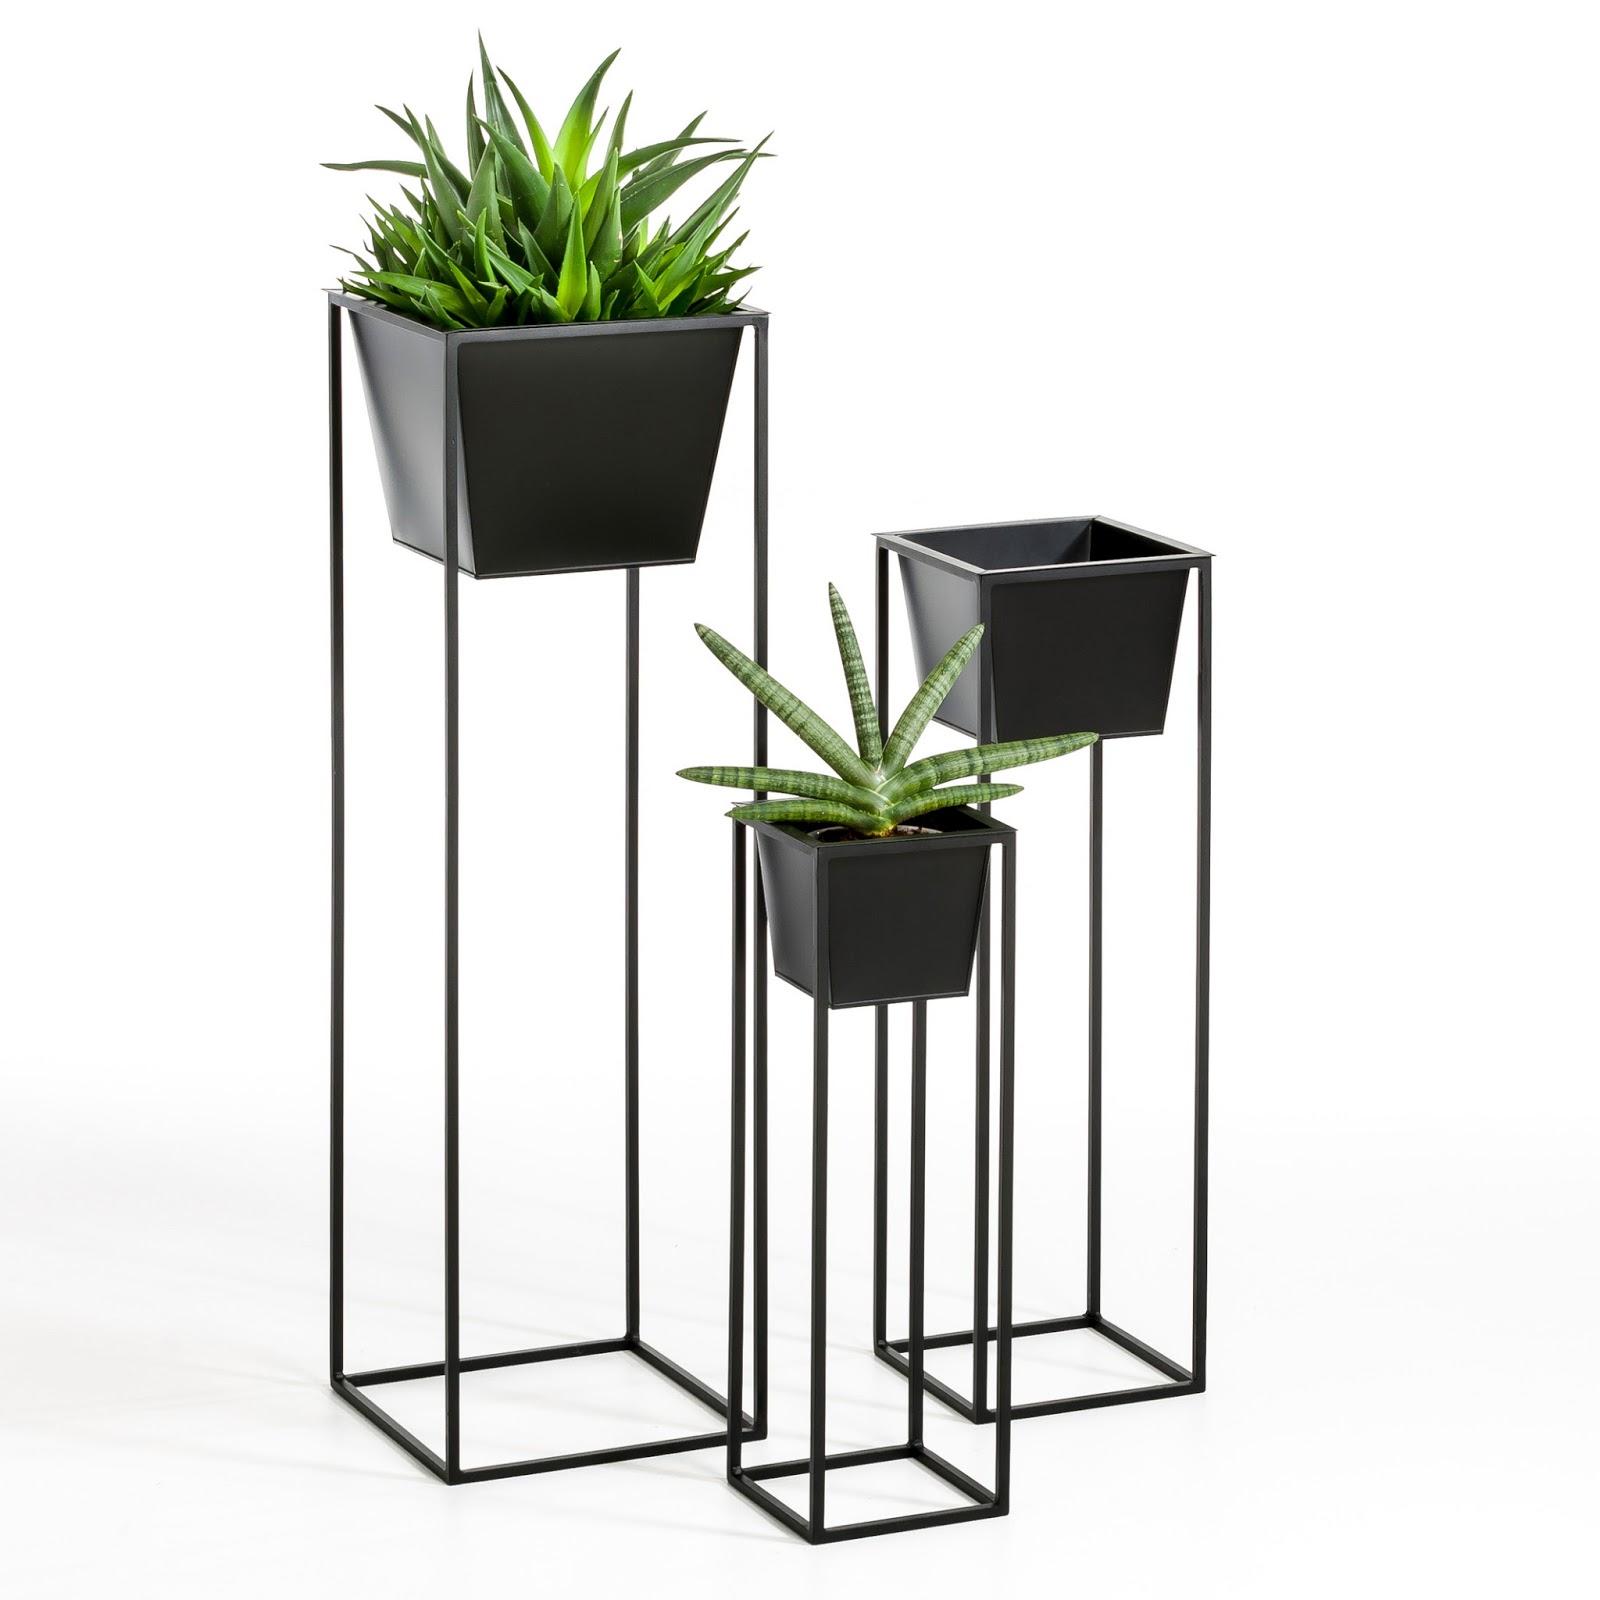 ampm console. Black Bedroom Furniture Sets. Home Design Ideas